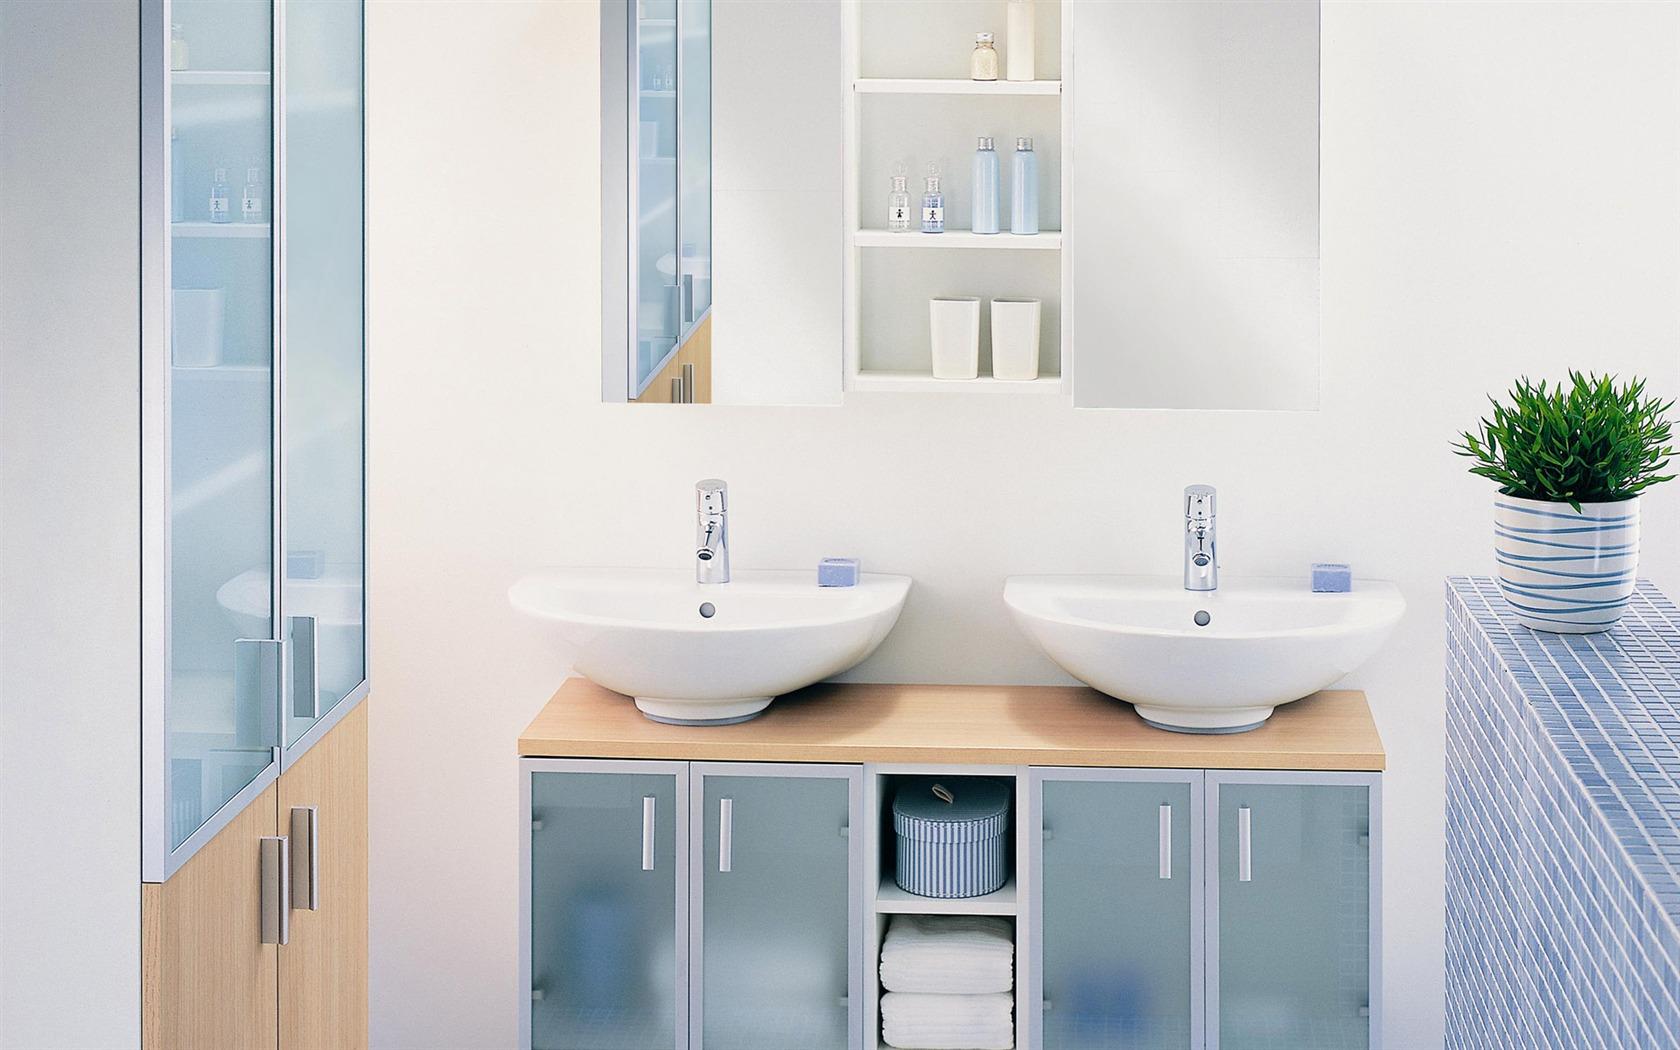 Fond d 39 cran photo salle de bain 2 1 1680x1050 fond d for Ecran salle de bain